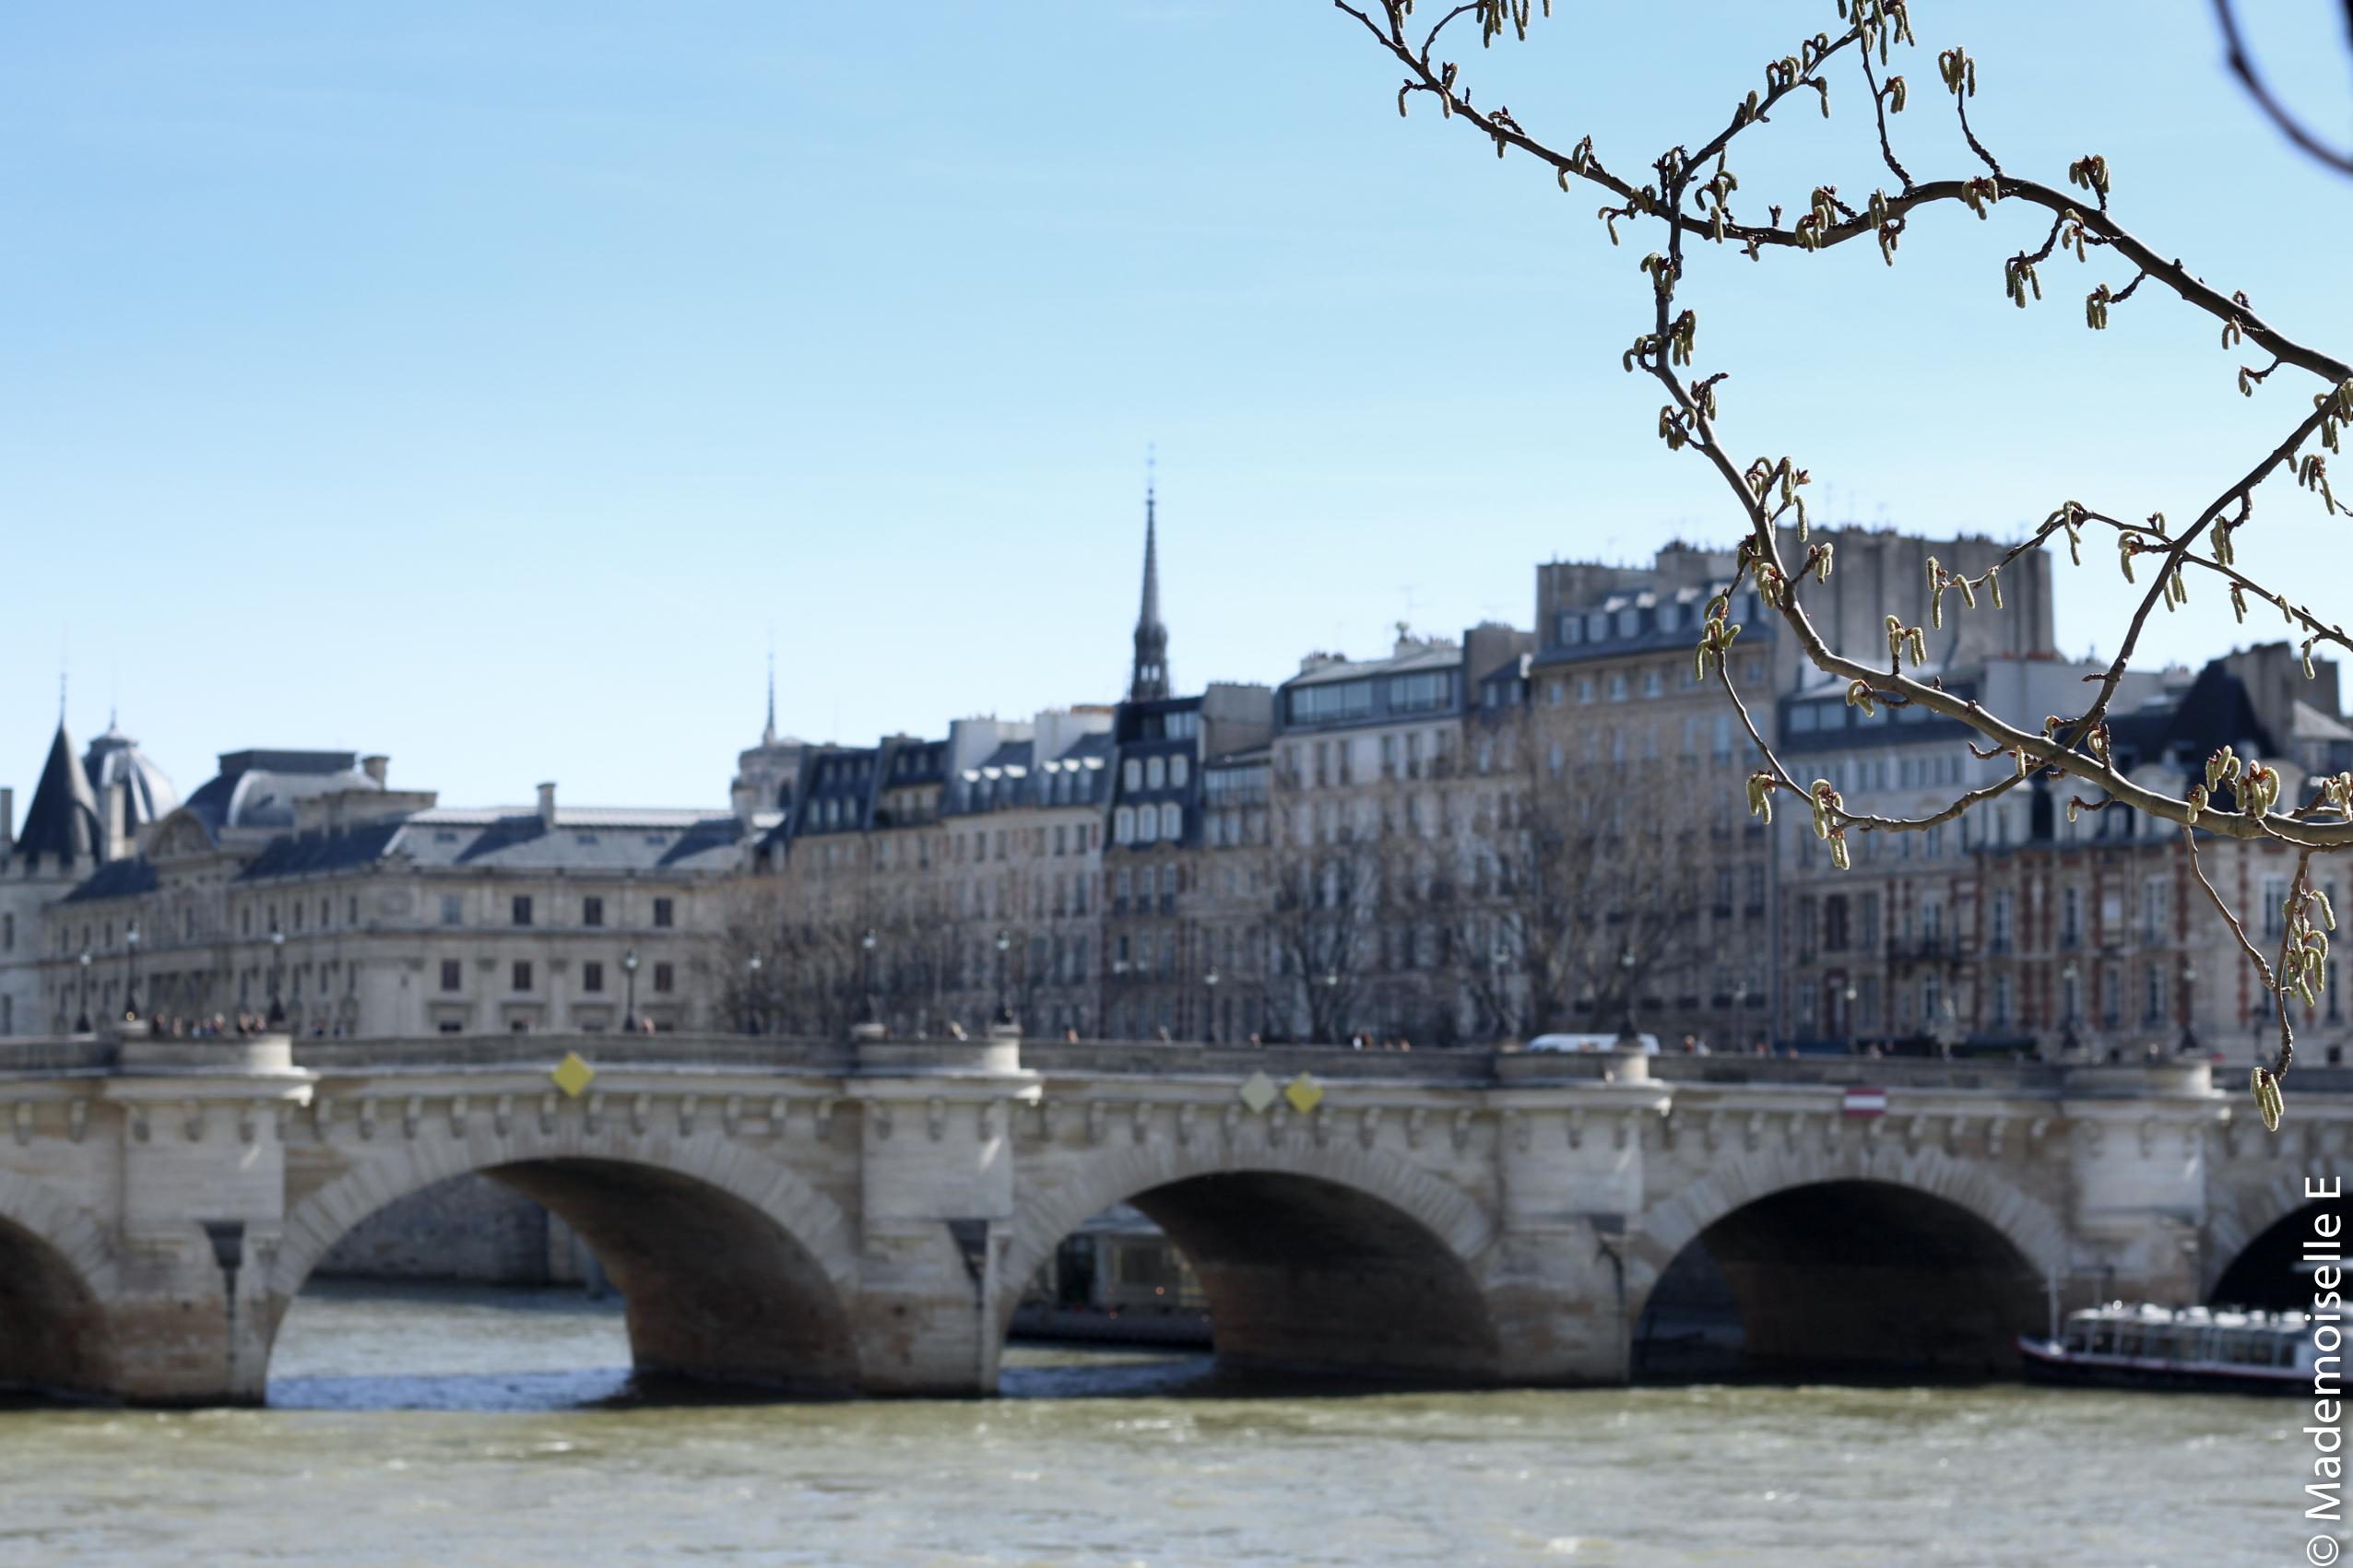 bonheurs #3 Paris seine mademoiselle-e